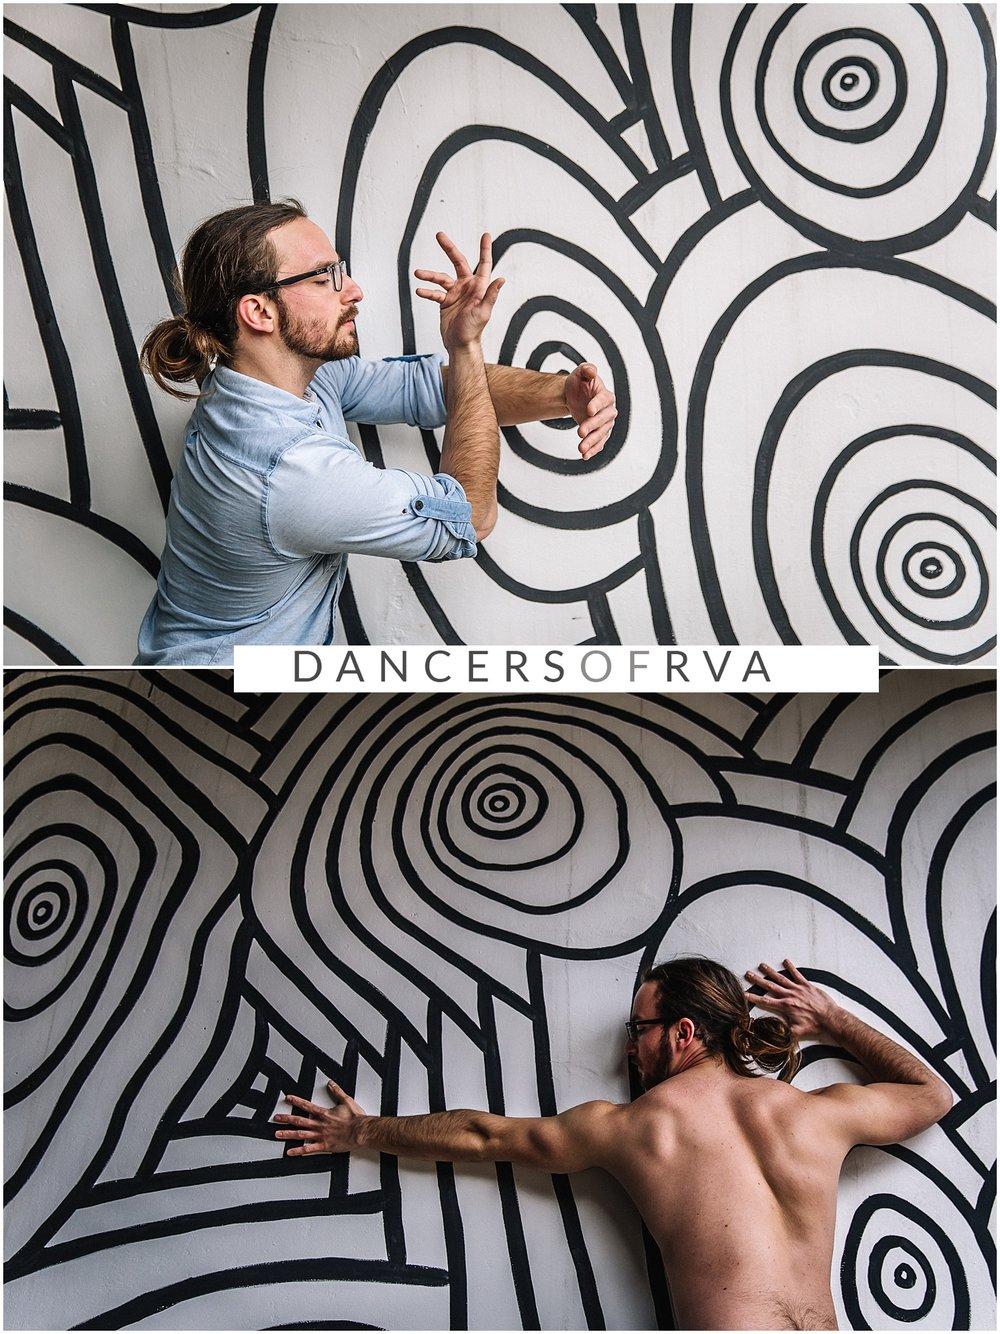 Dance photoshoot at canal walk mural